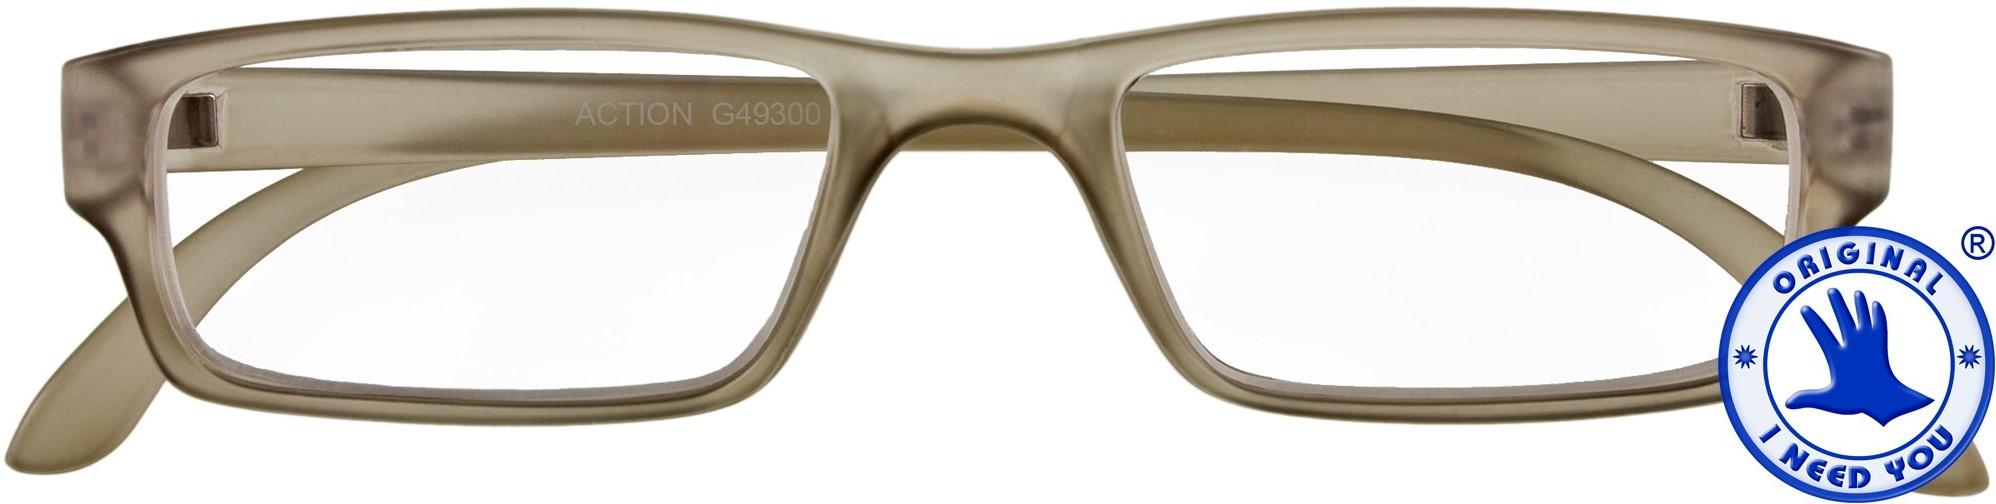 d5a9b71657269b Leesbril I Need You model Action kleur mat grijs sterkte +2.00dpt ...